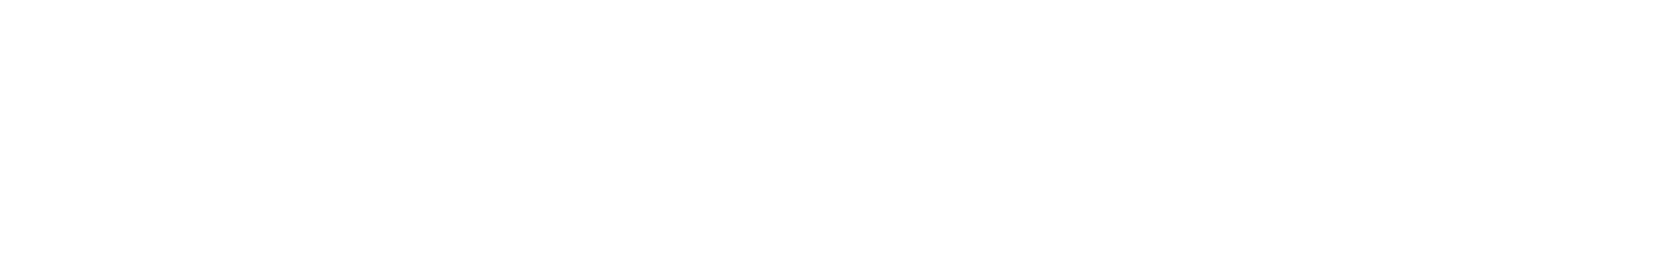 MathType logo monochrome